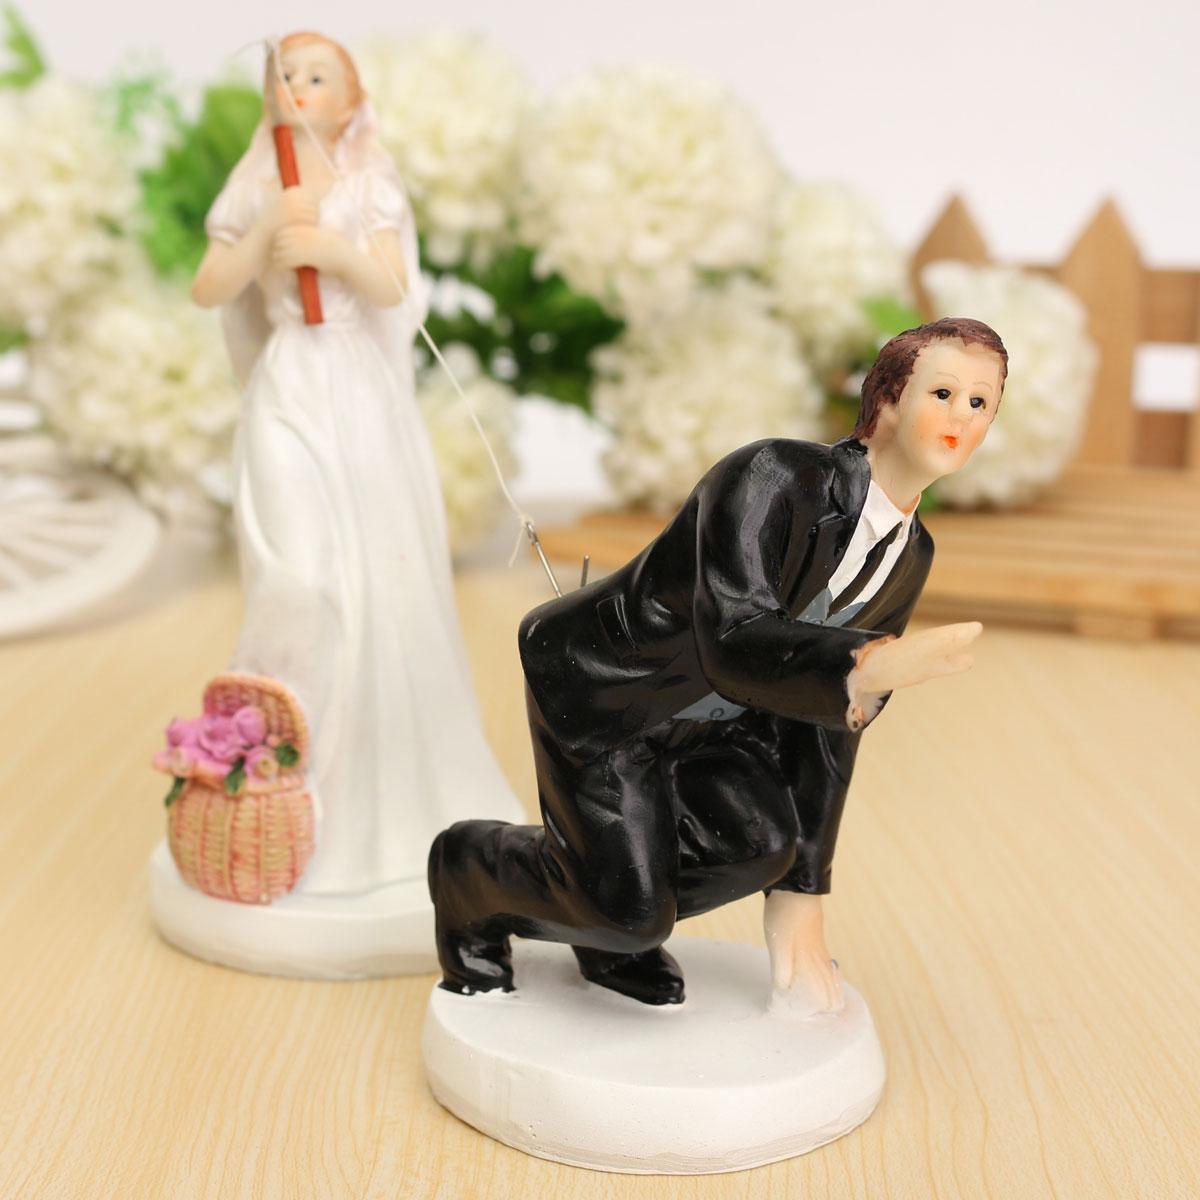 Bride And Groom Only Wedding Ideas: Bride Groom Resin Wedding Cake Topper Couple Figurine